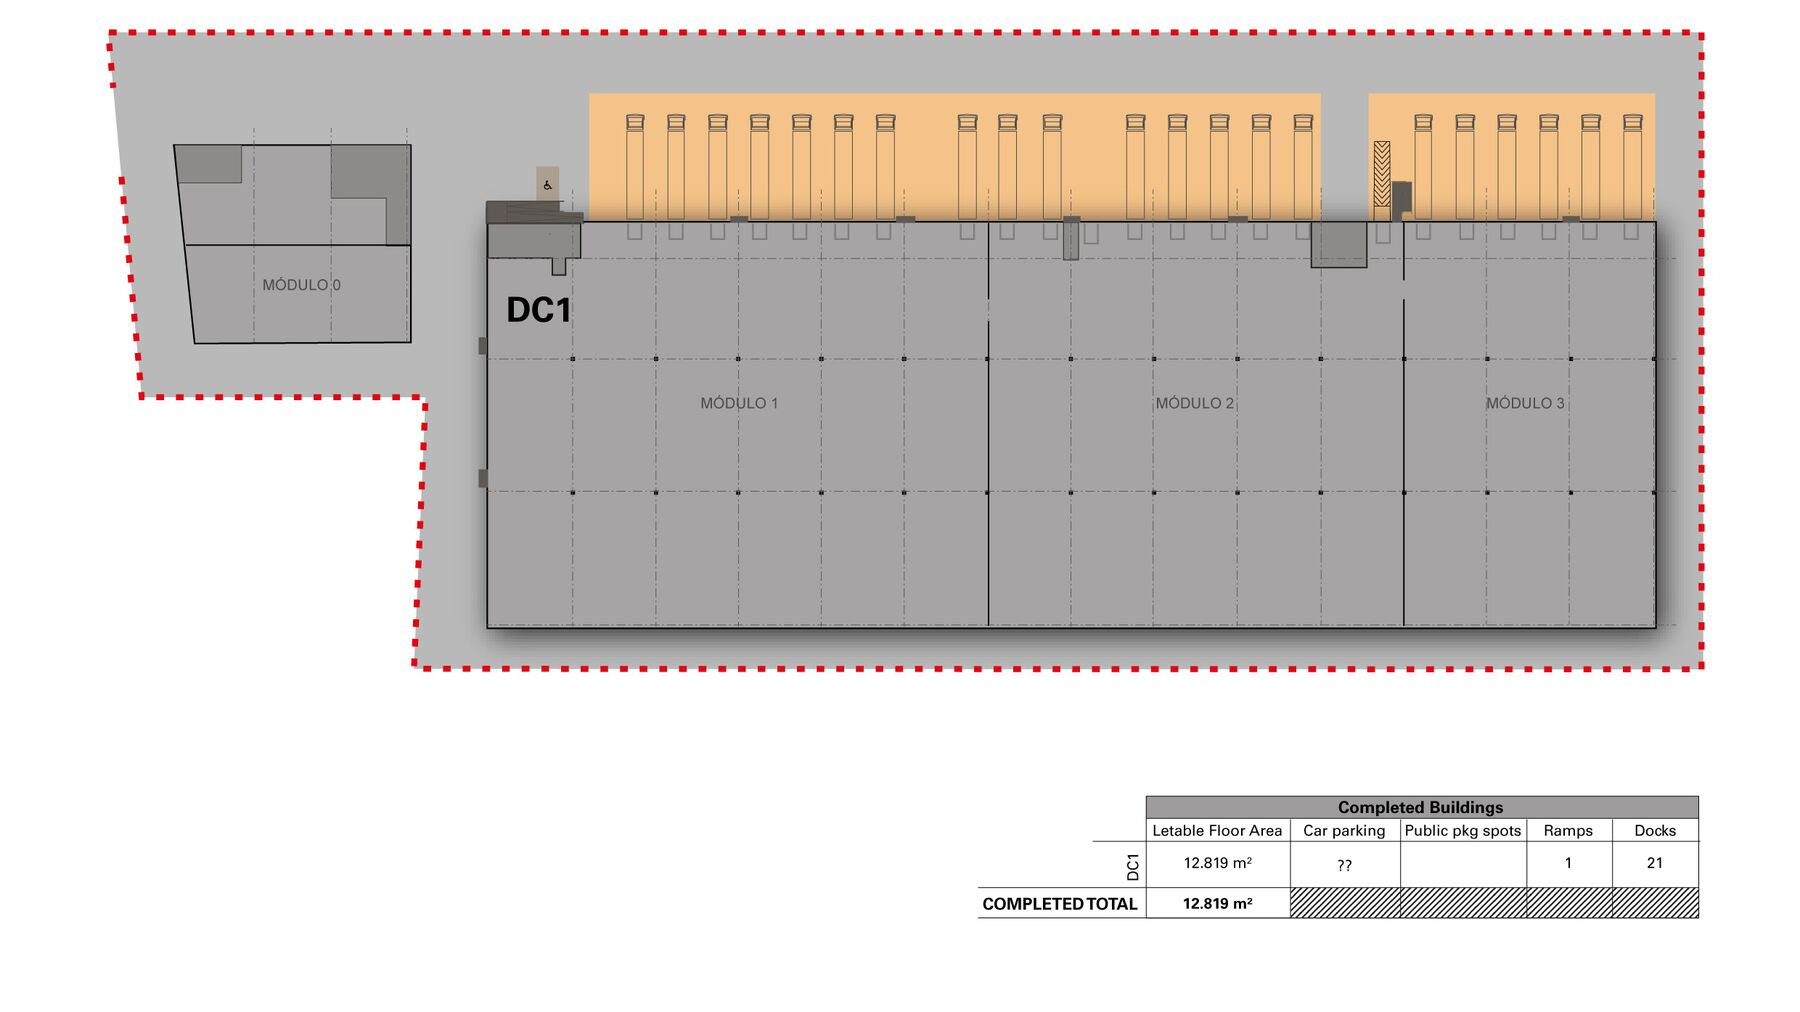 DPM-Azuqueca-DC1_Site-Plan.jpg